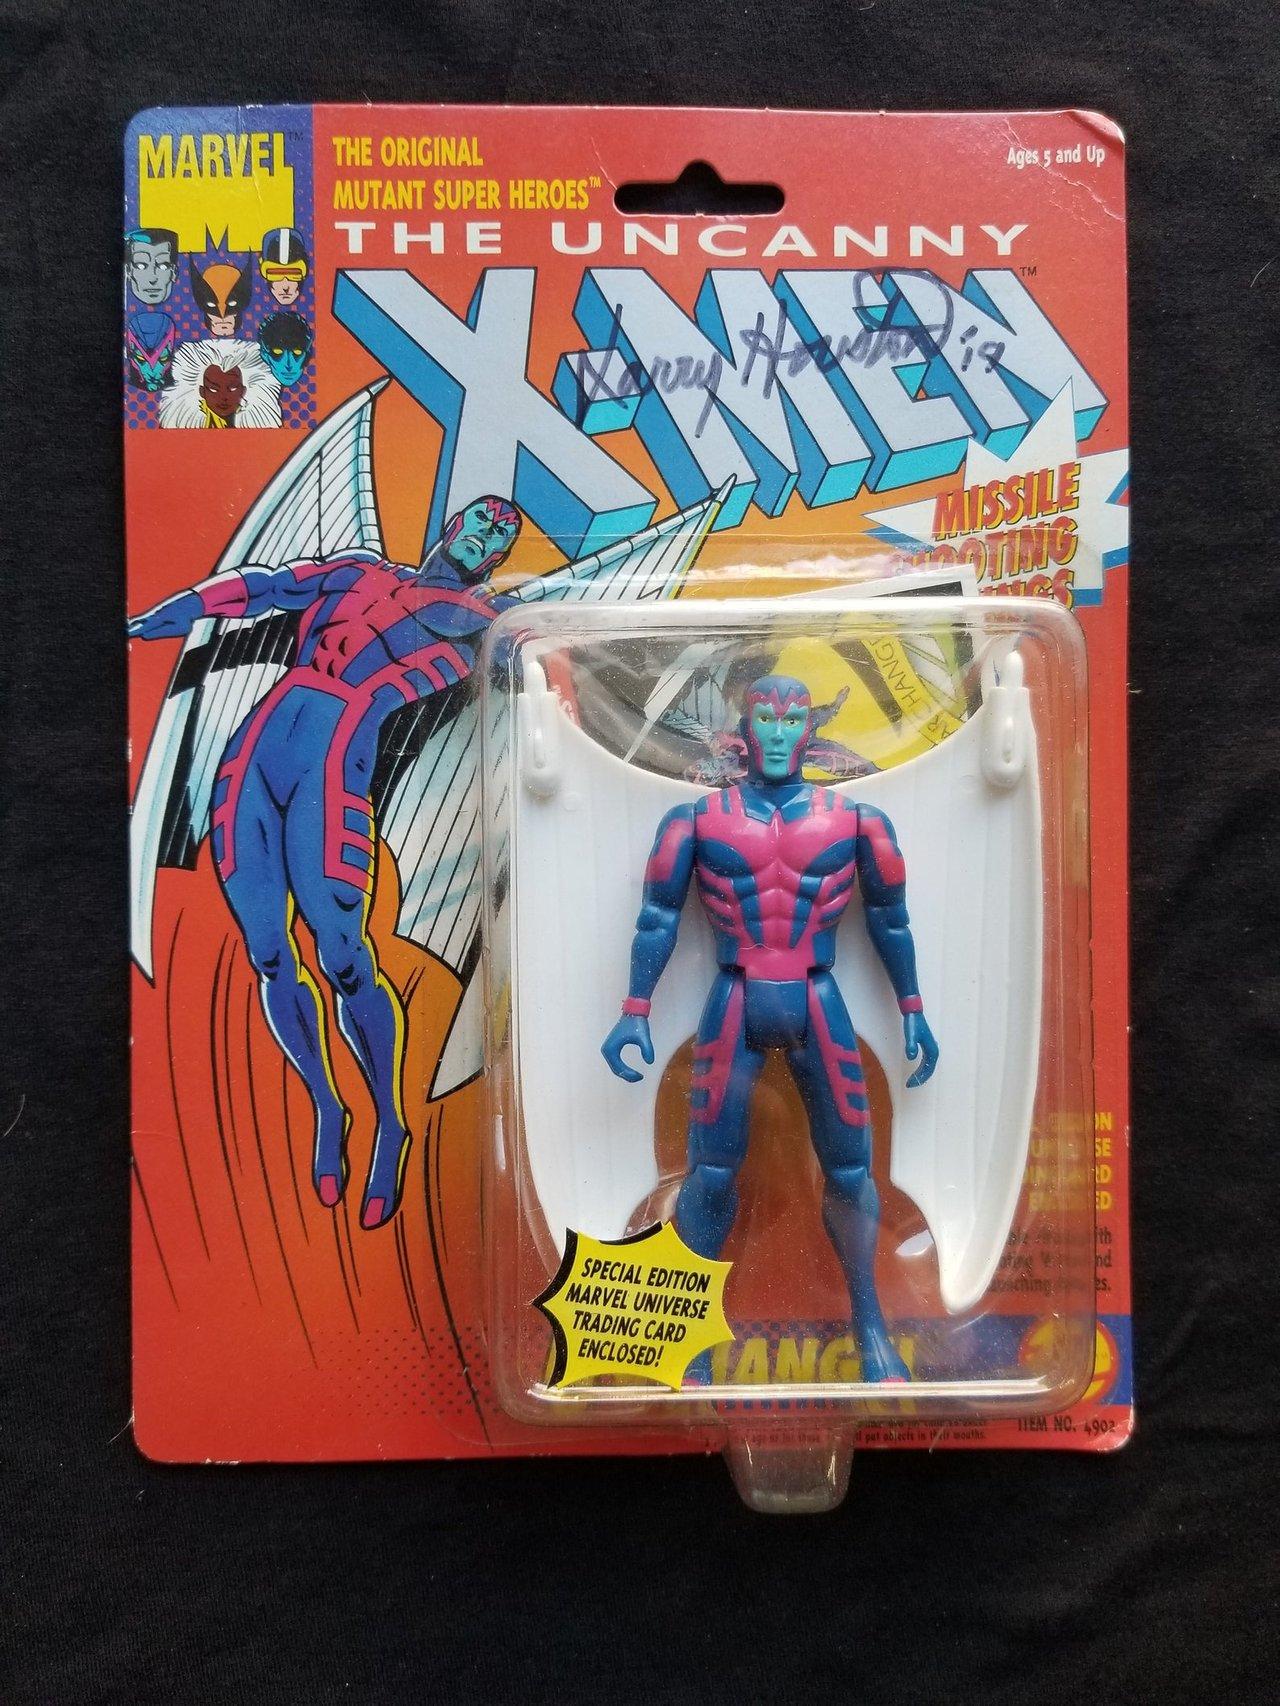 Autographed Toy Biz Archangel Marvel Uncanny X-Men Vintage Signed Action Figure Animated Series Retro Toys Collectibles 1990s